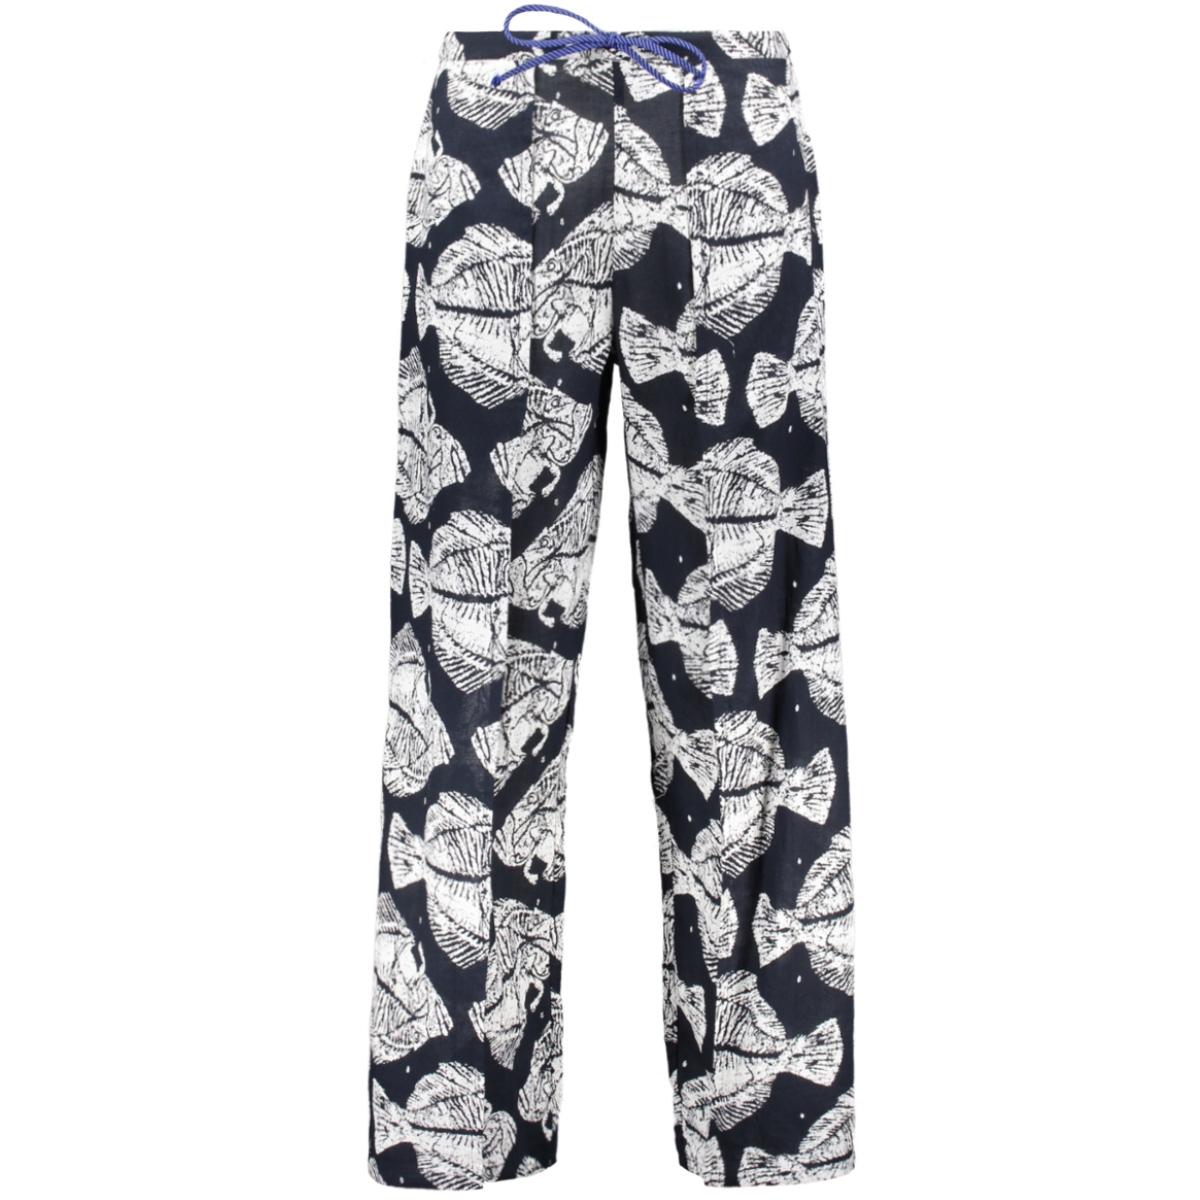 beach pants piranha 20 008 0202 10 days broek dark grey blue